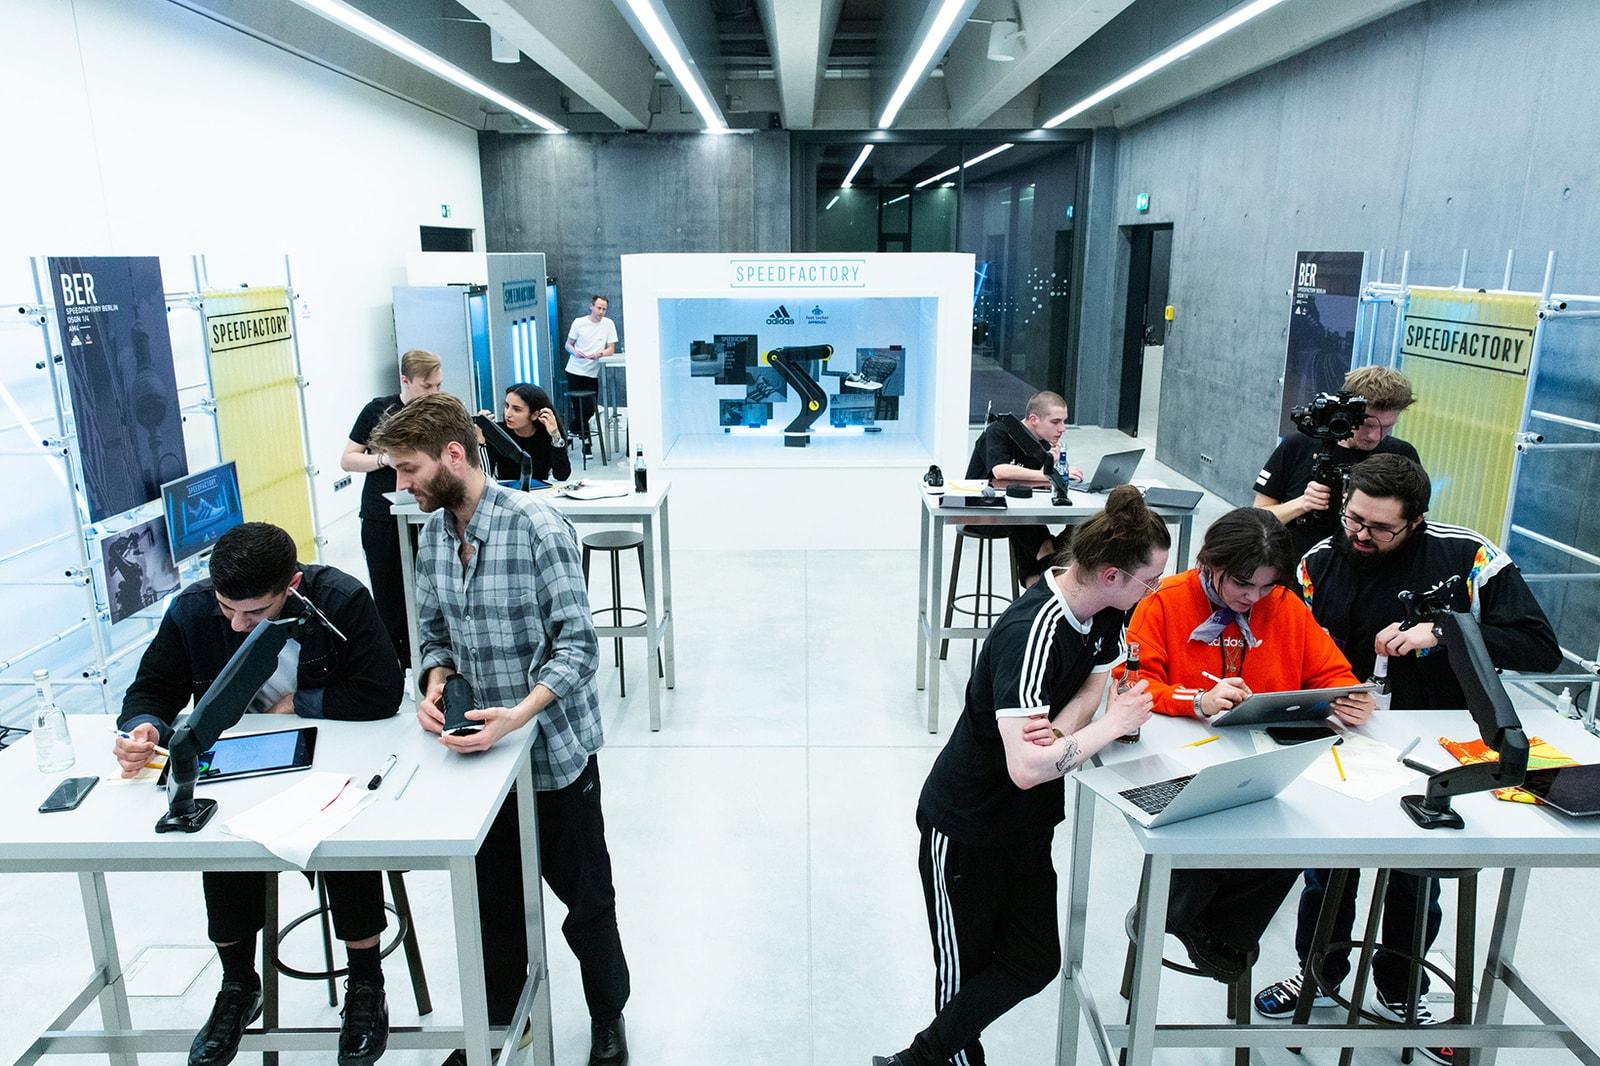 adidas SPEEDFACTORY Foot Locker City Designs Europe